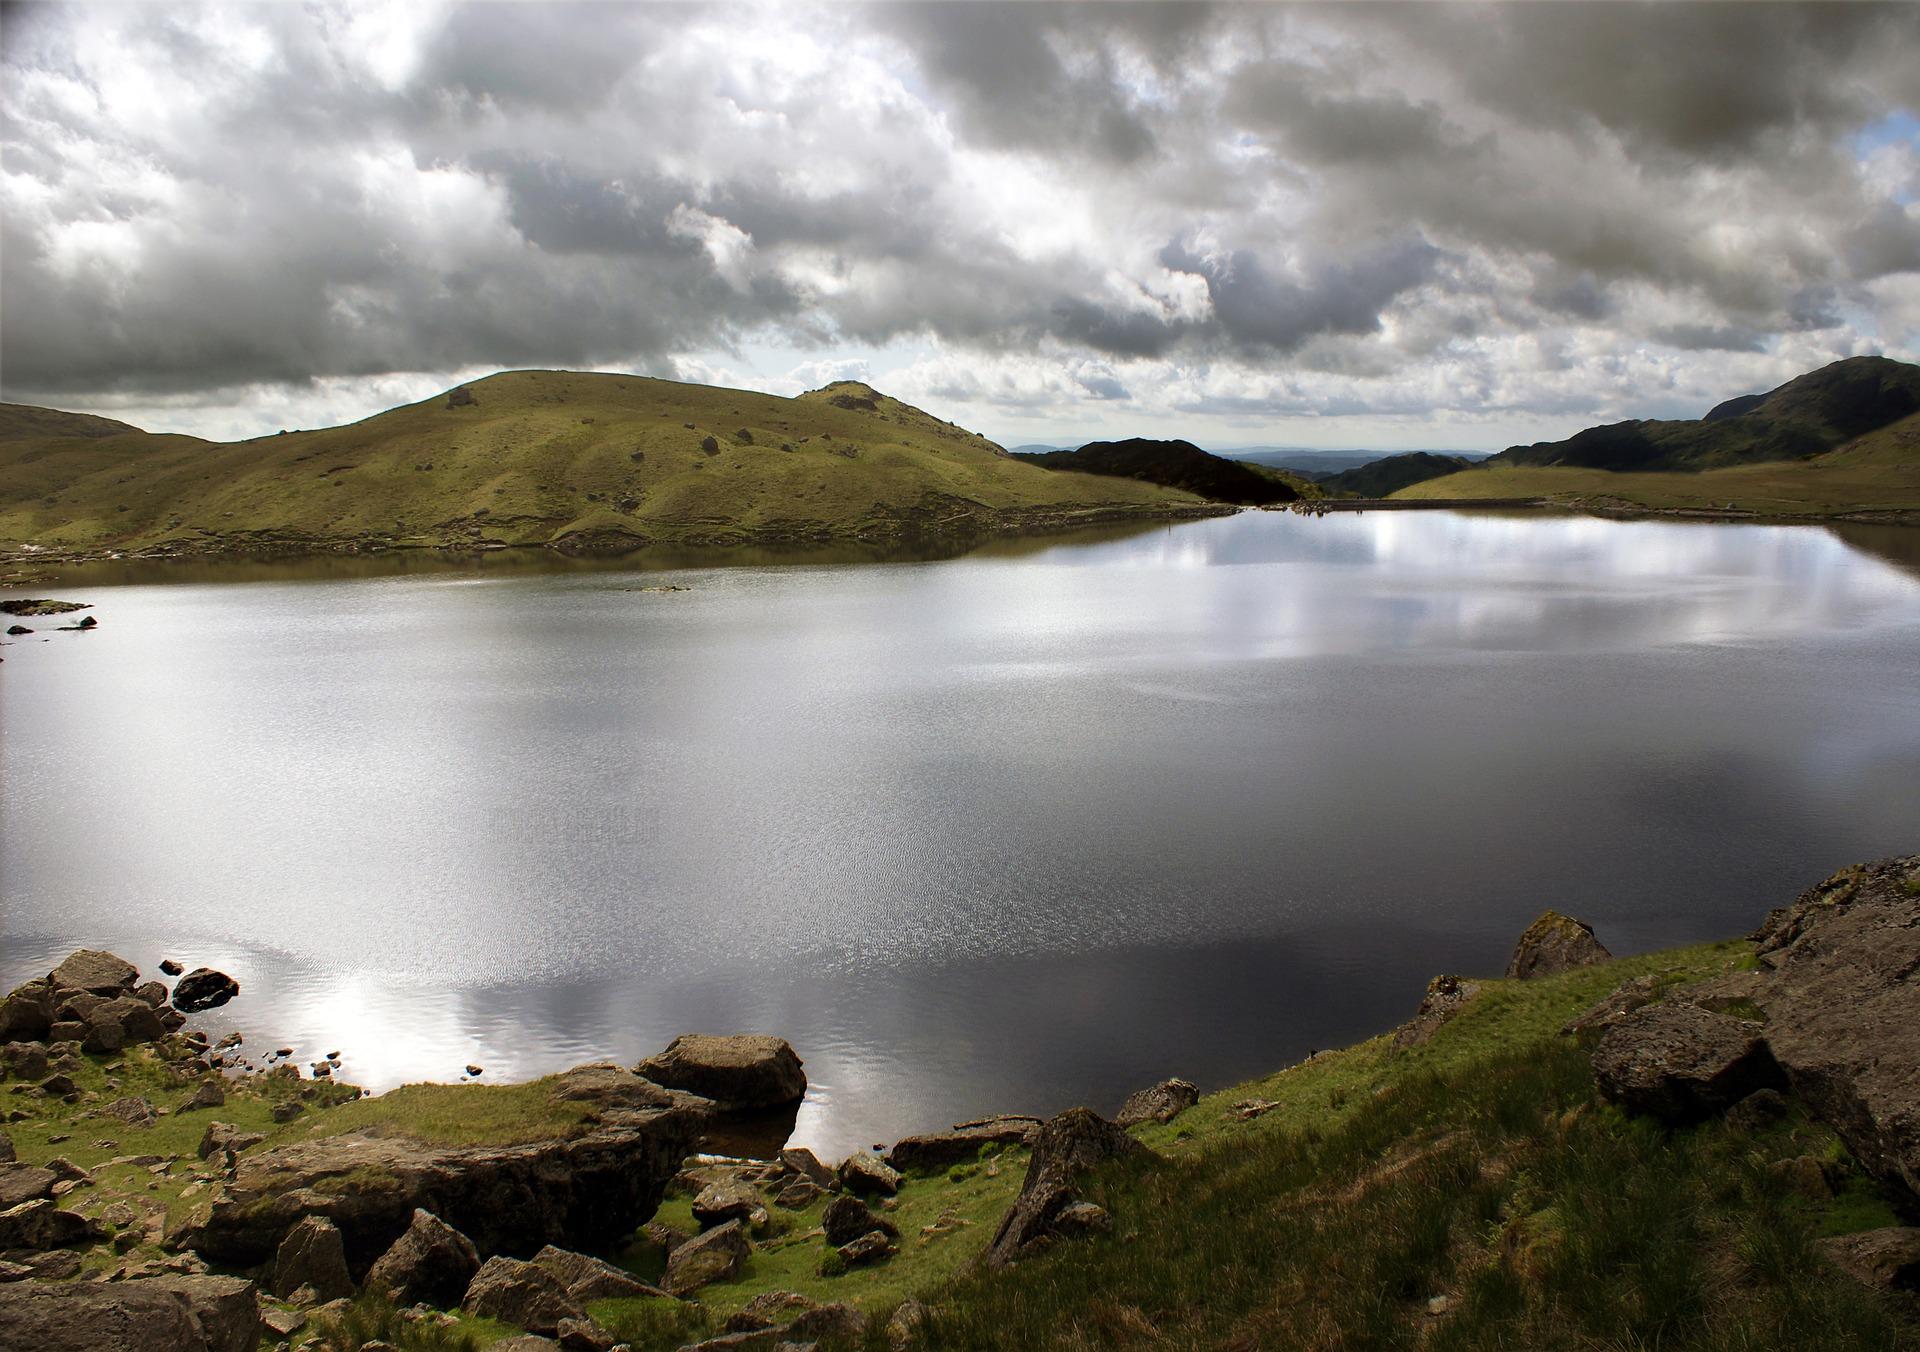 the-lake-district-1528164_1920.jpg?1566832995